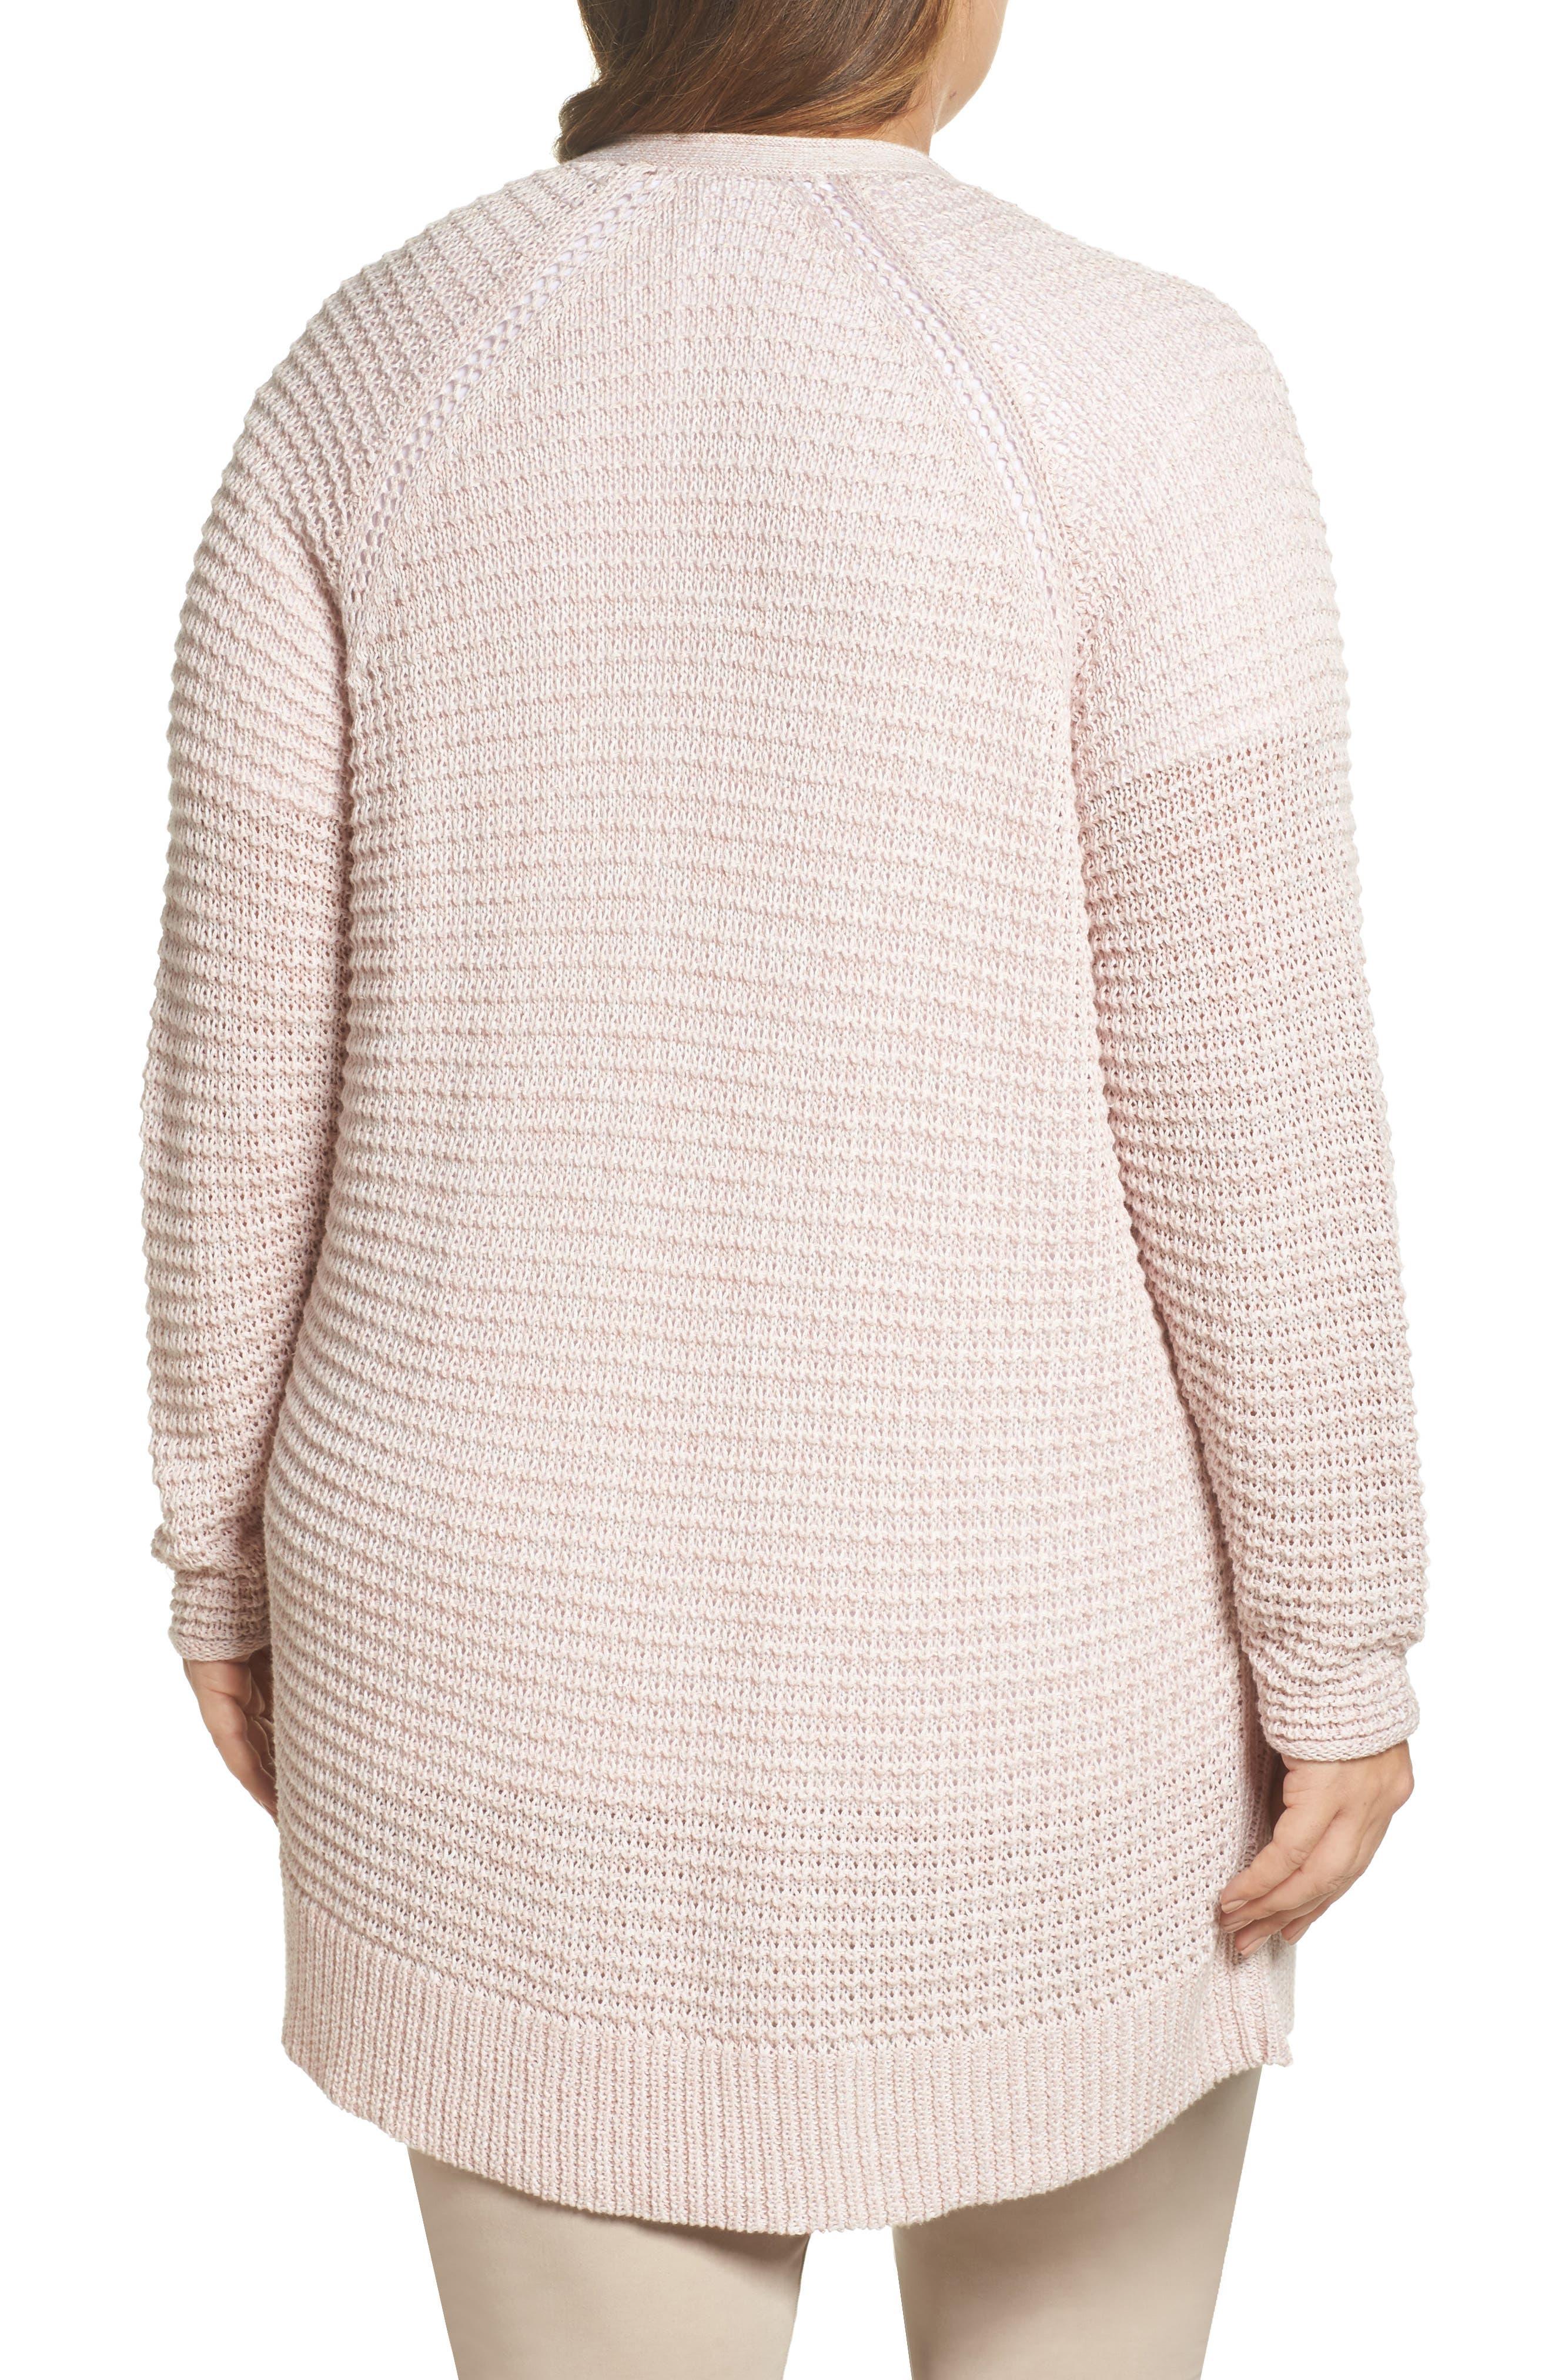 Easy Knit Cardigan,                             Alternate thumbnail 2, color,                             Beige Linen Fern Marl